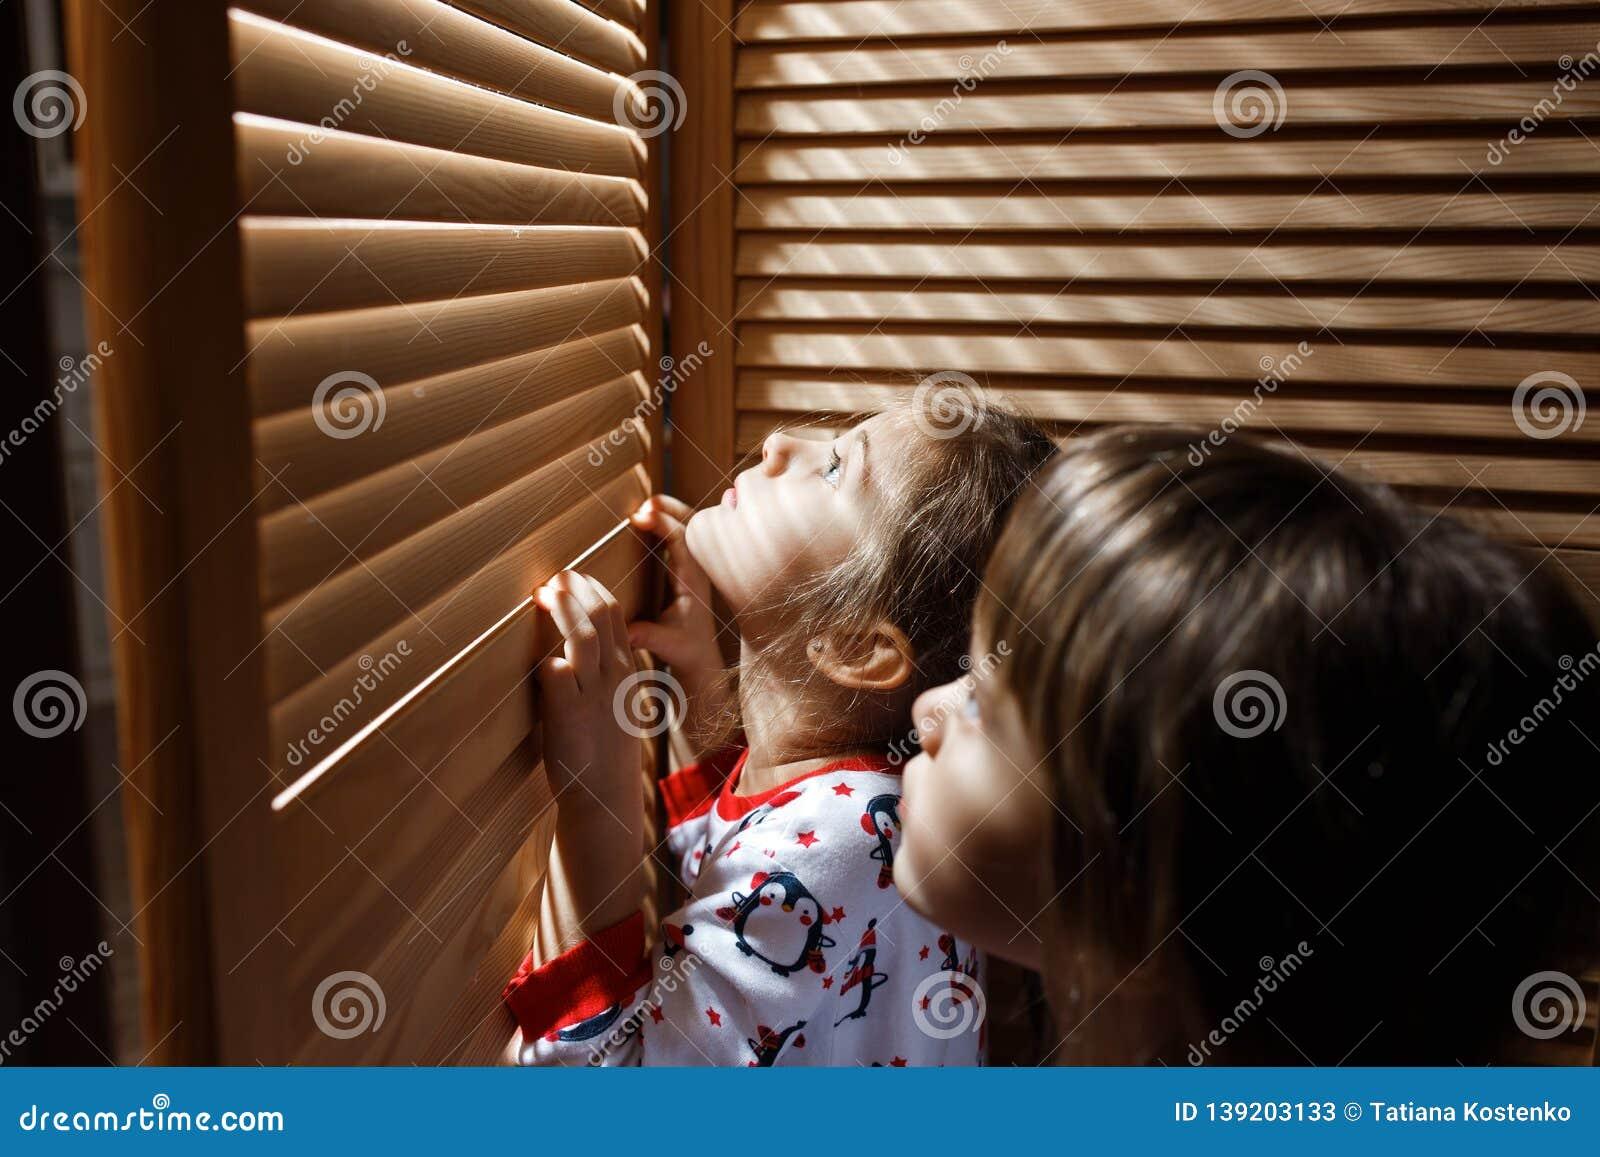 Mofos - sisters friend hiding in closet